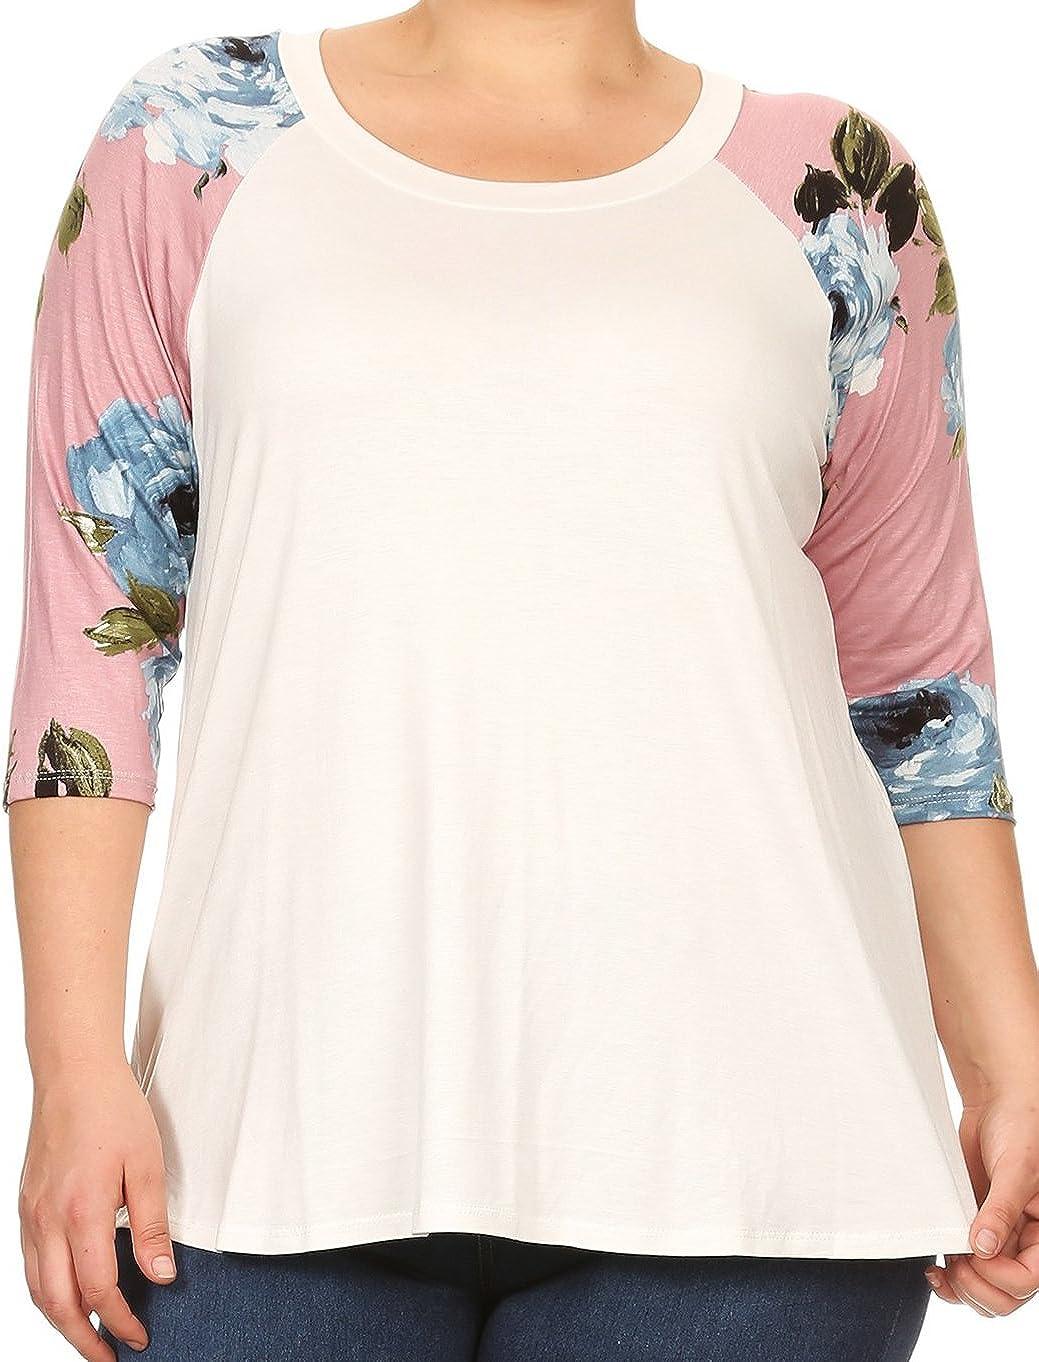 BNY Corner Women Plus Size Solid Raglan Floral Sleeve Knit Top Tee Blouse Shirt